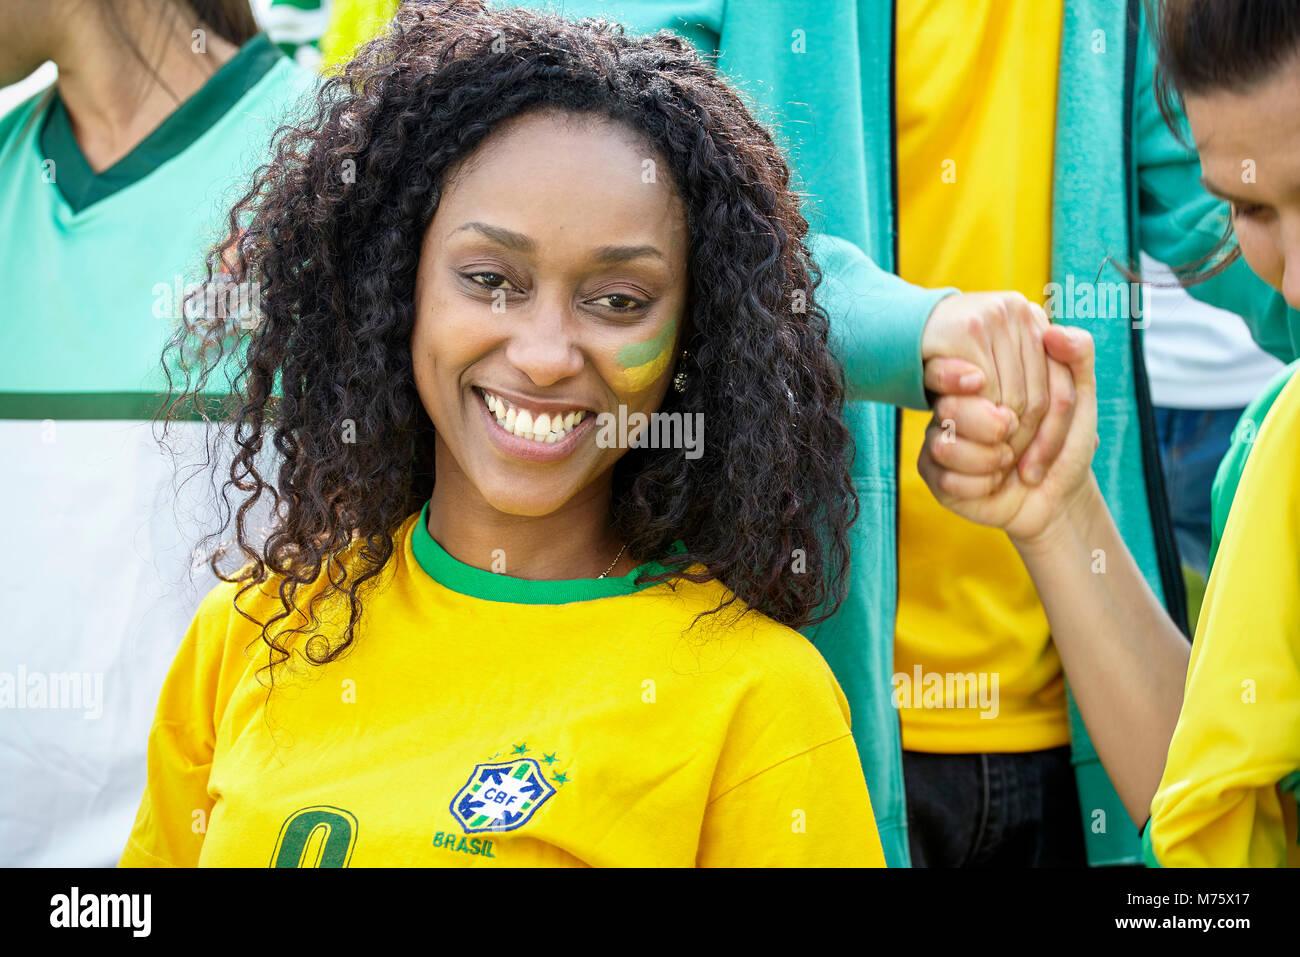 Brasilianischen Fußball-Anhänger fröhlich lächelnd, Porträt Stockbild